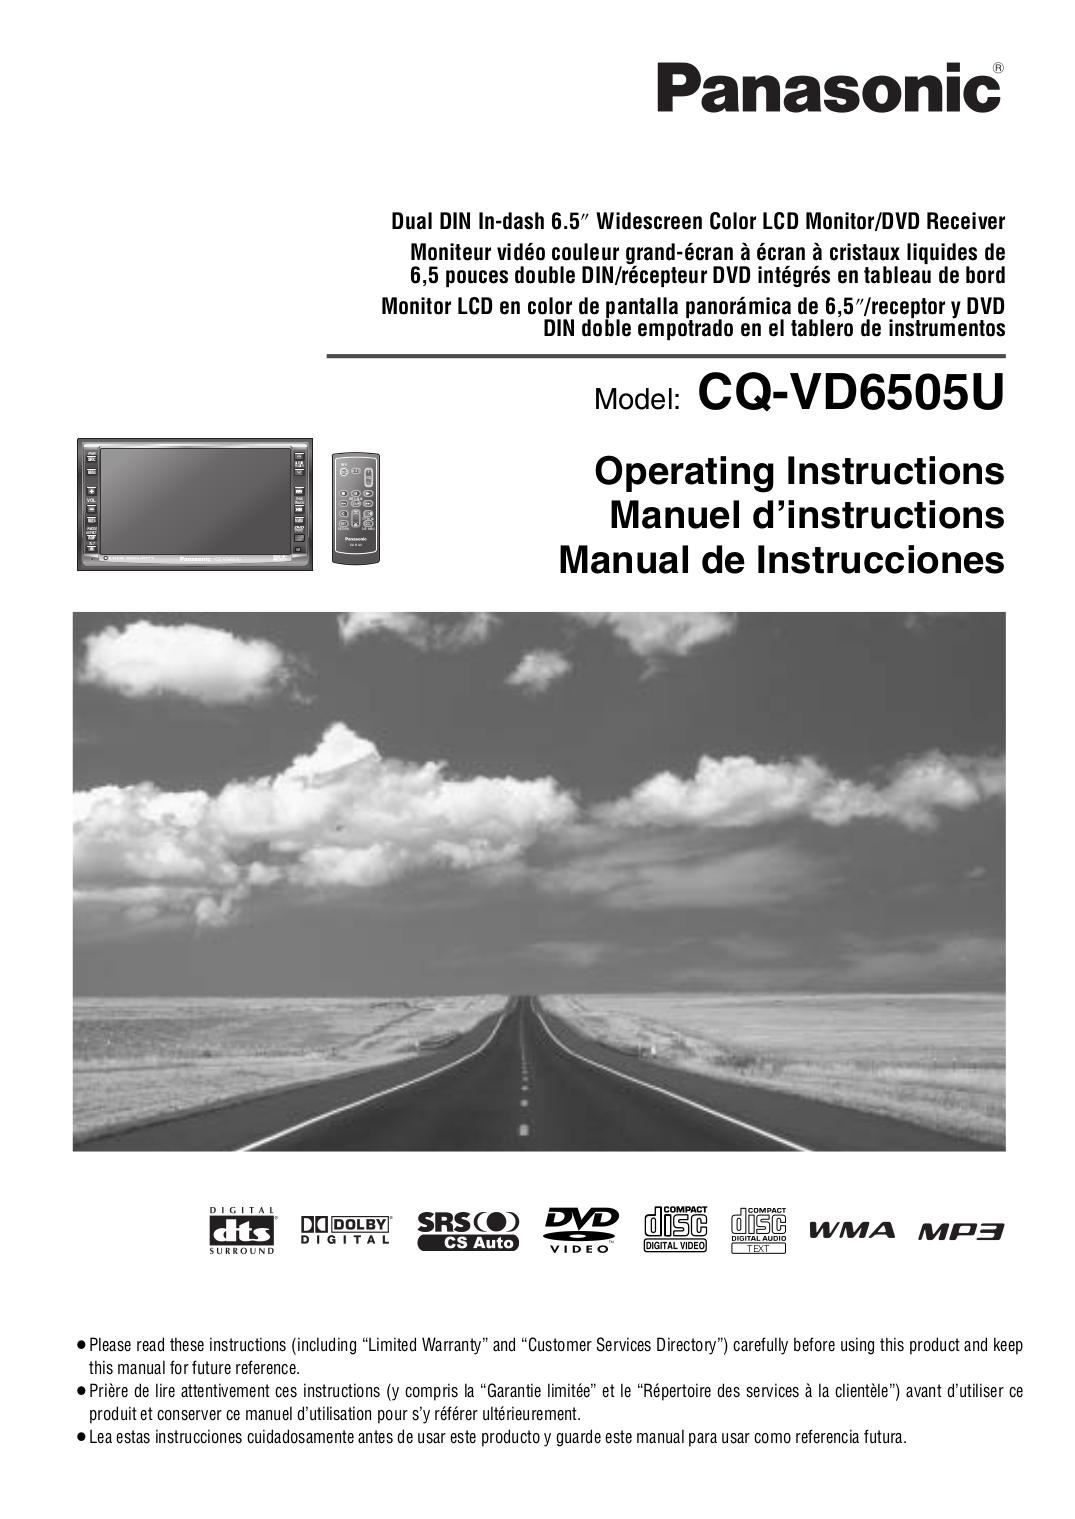 pdf for Panasonic Car Video CQ-VD6505U manual